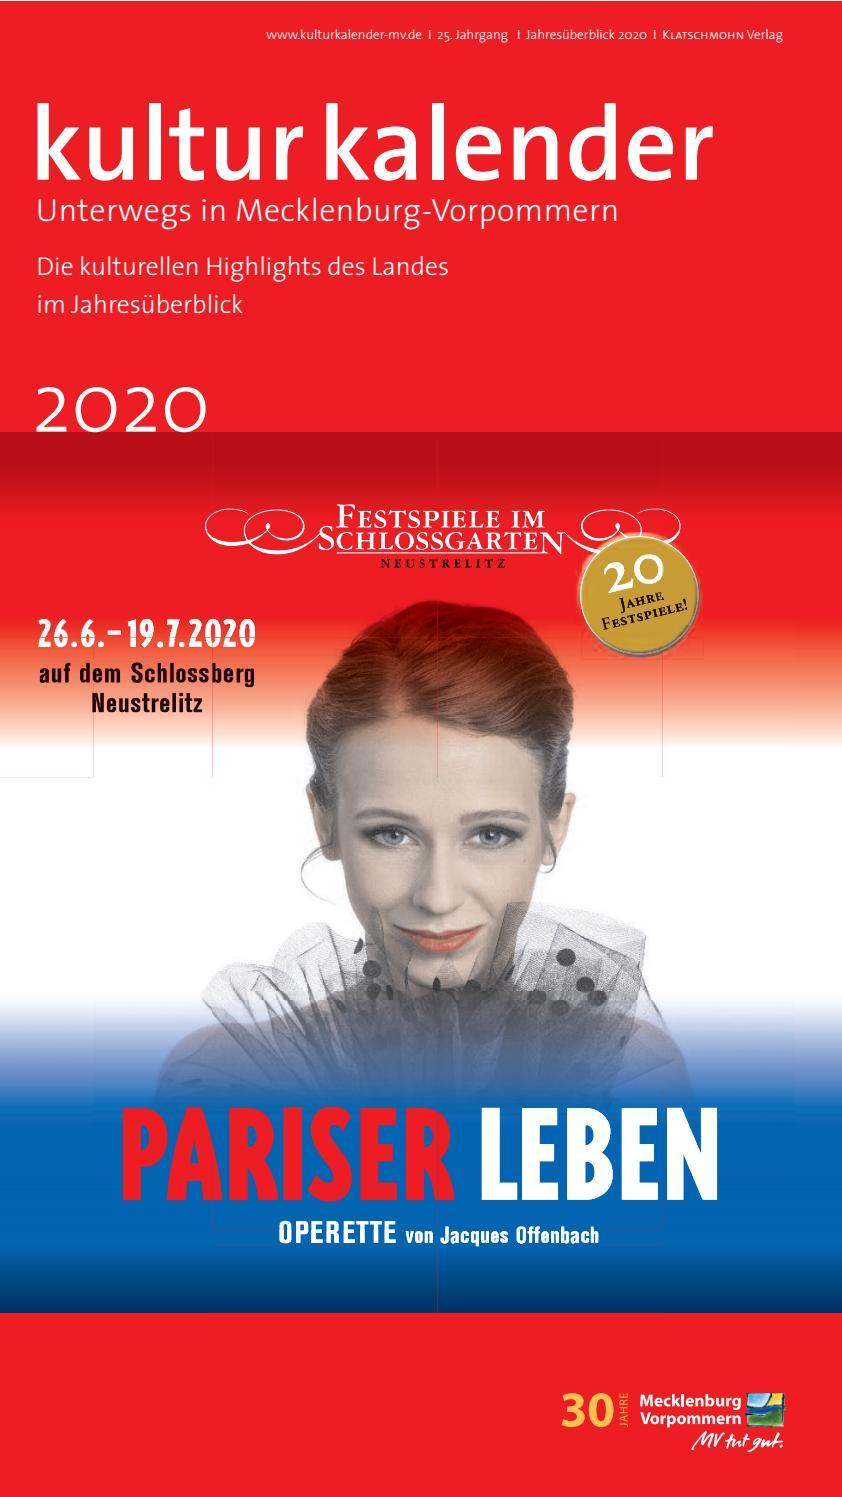 festspiele mv 2020